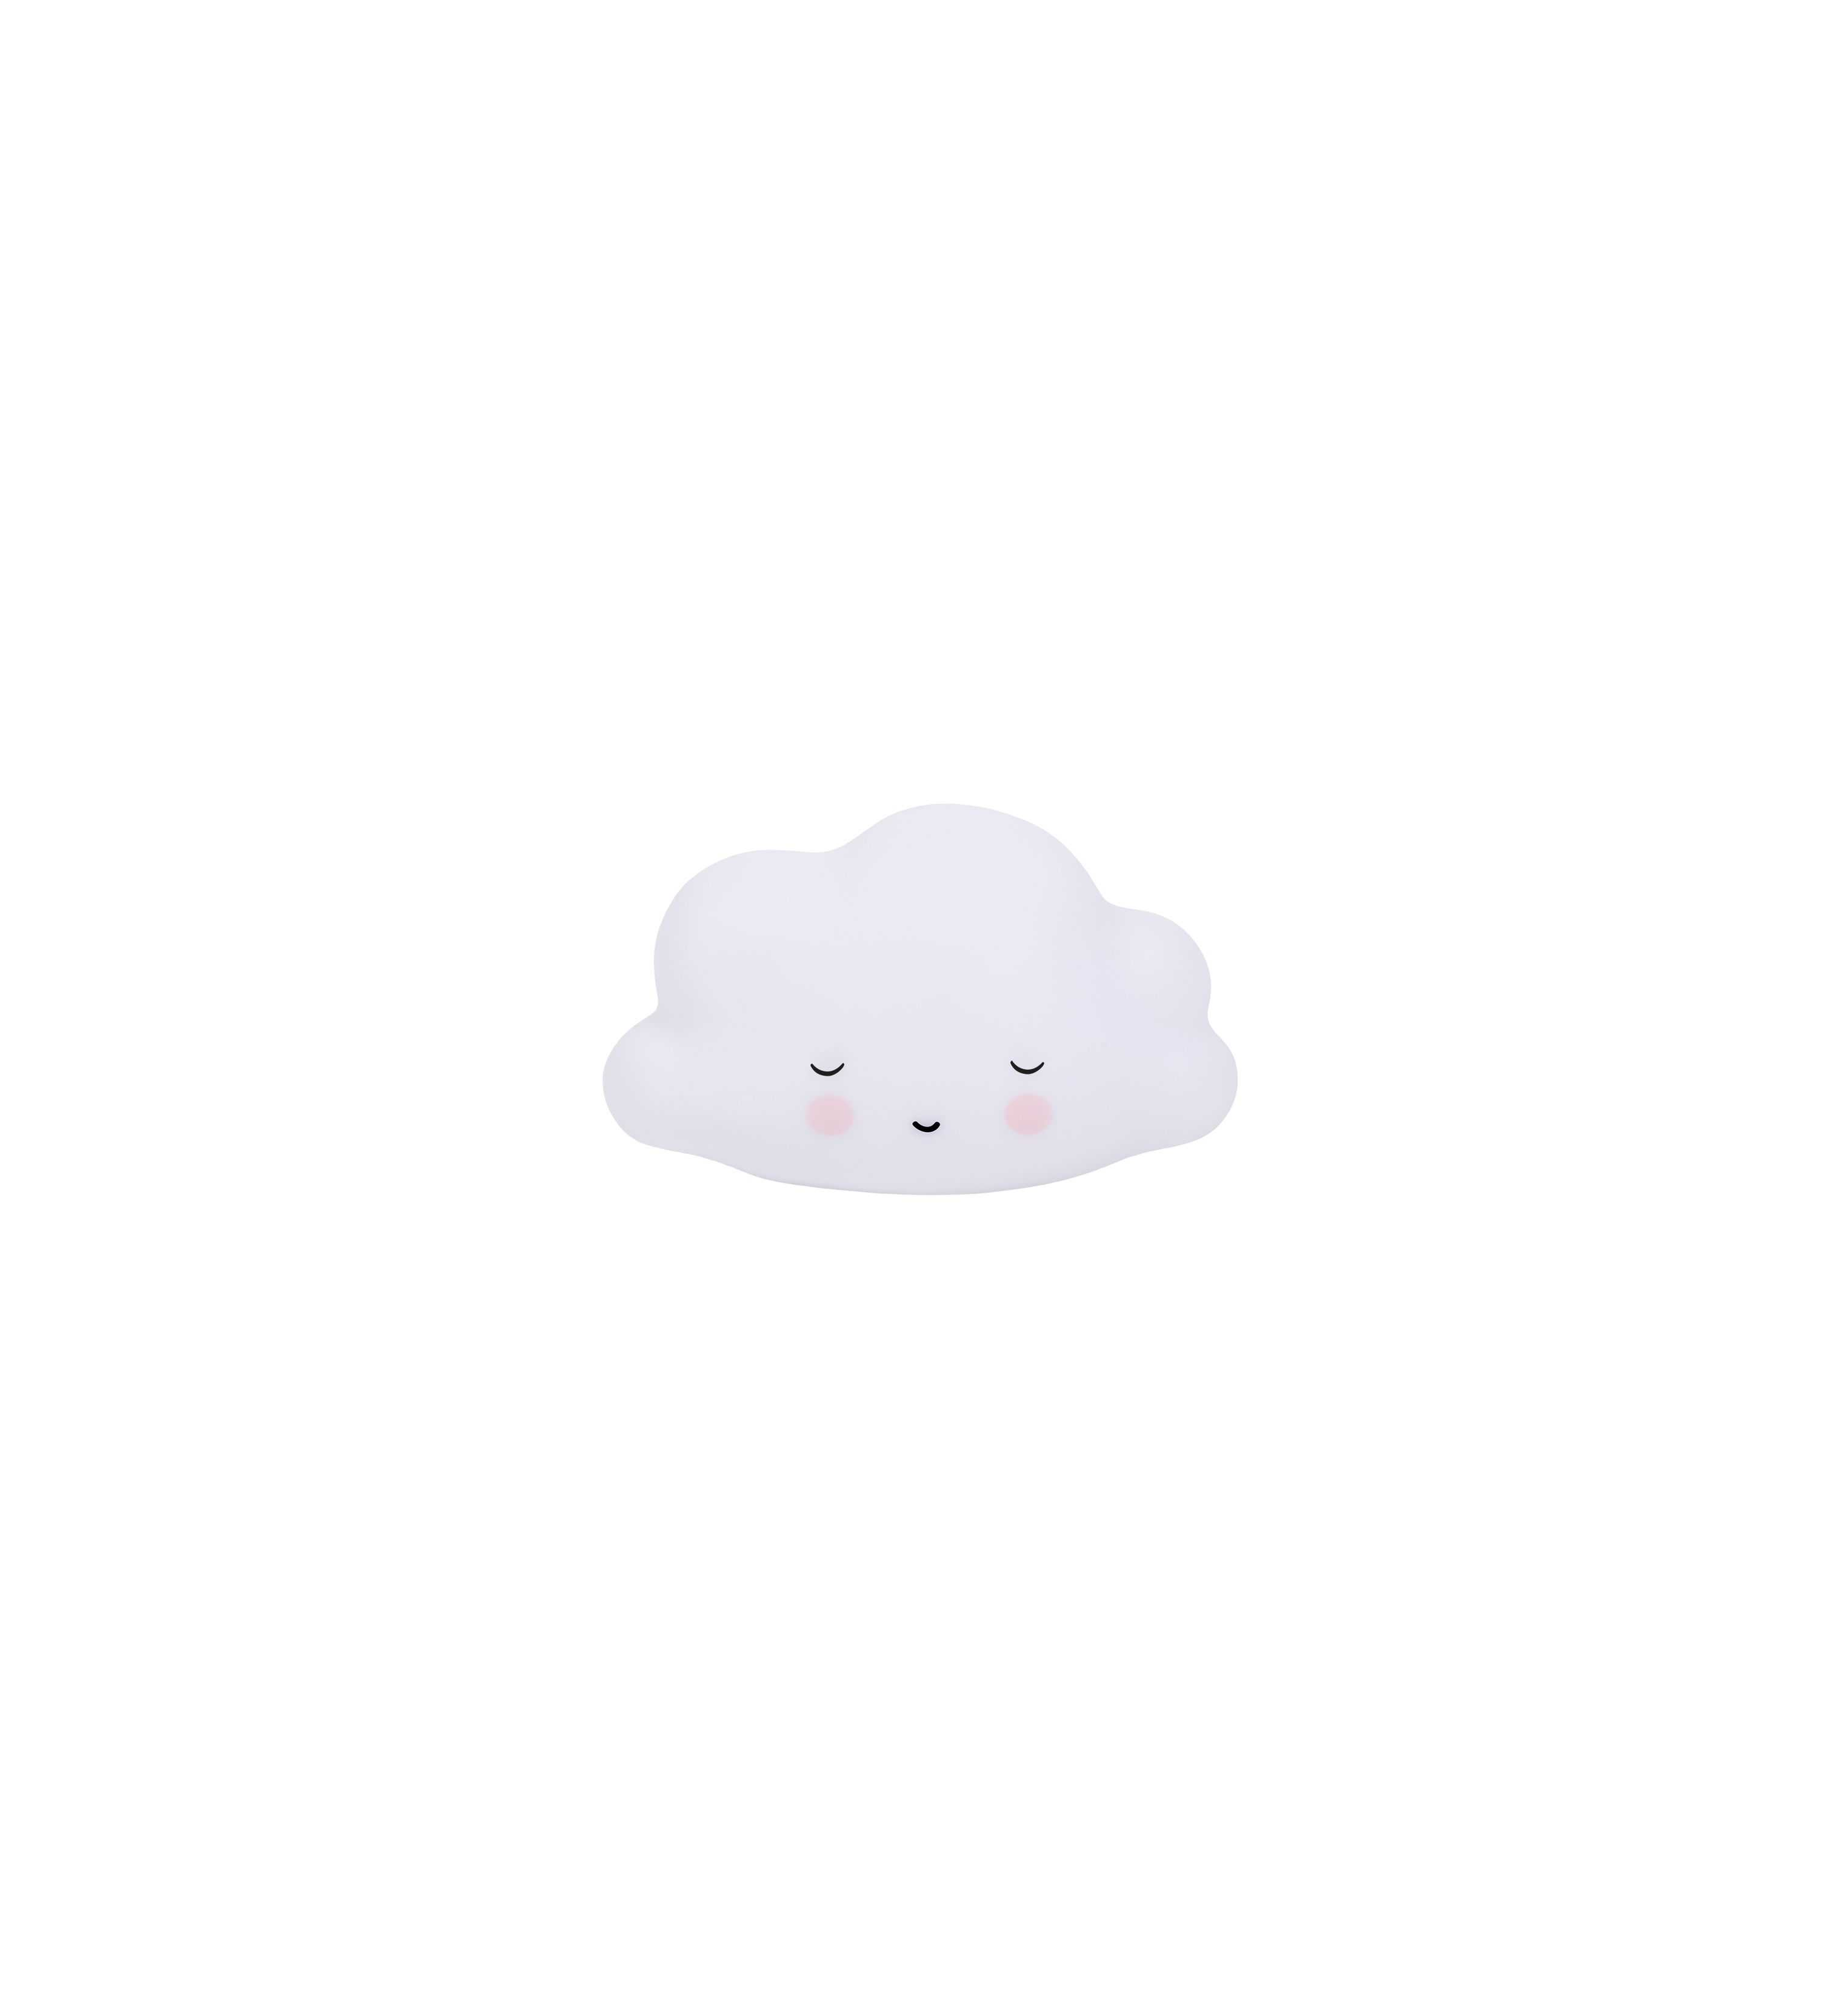 Veilleuse nuage blanc endormi